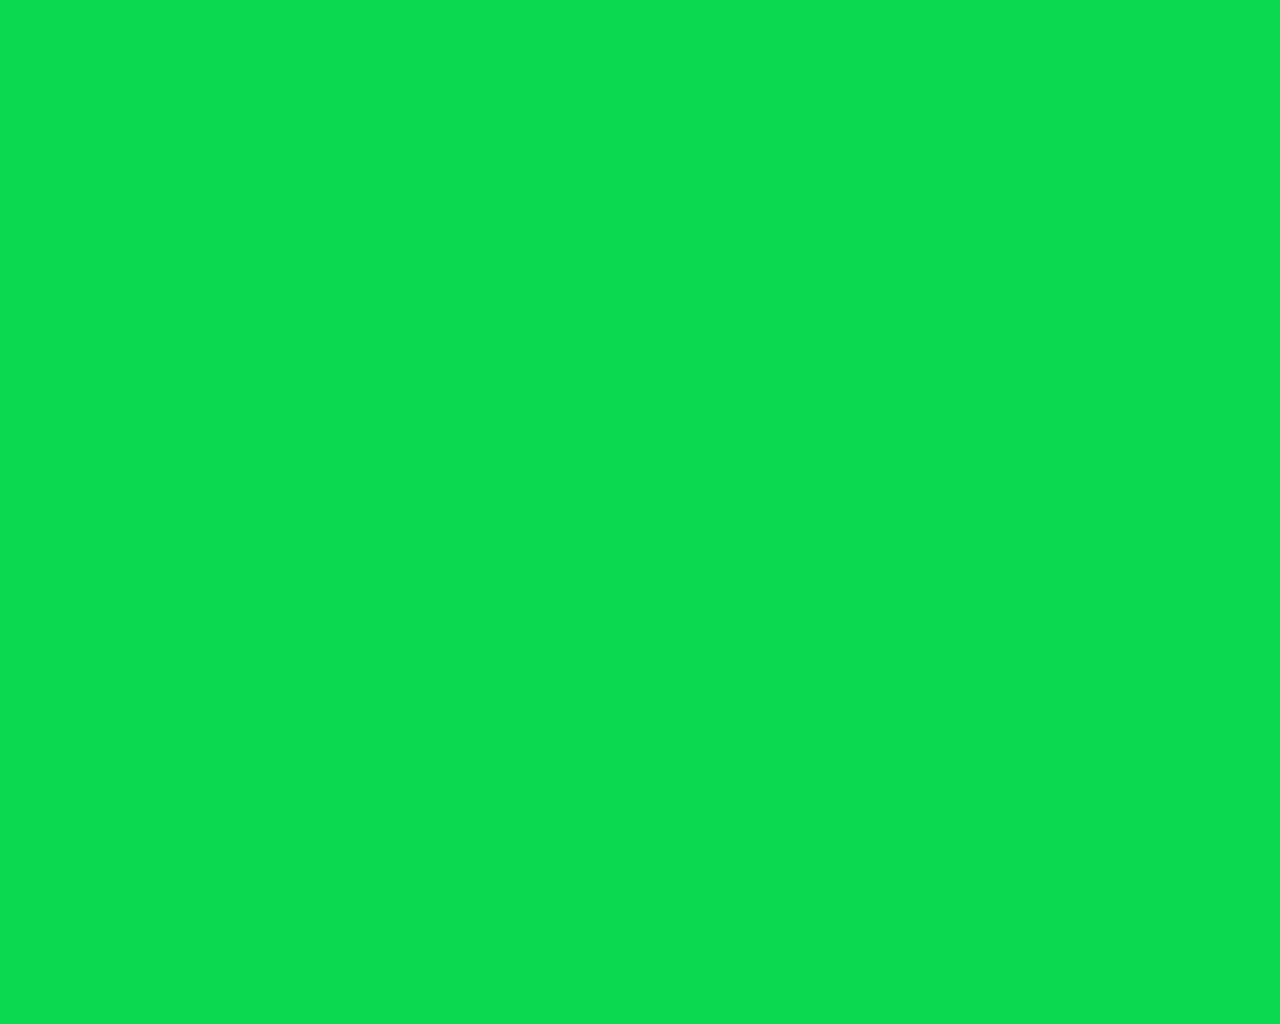 1280x1024 Malachite Solid Color Background